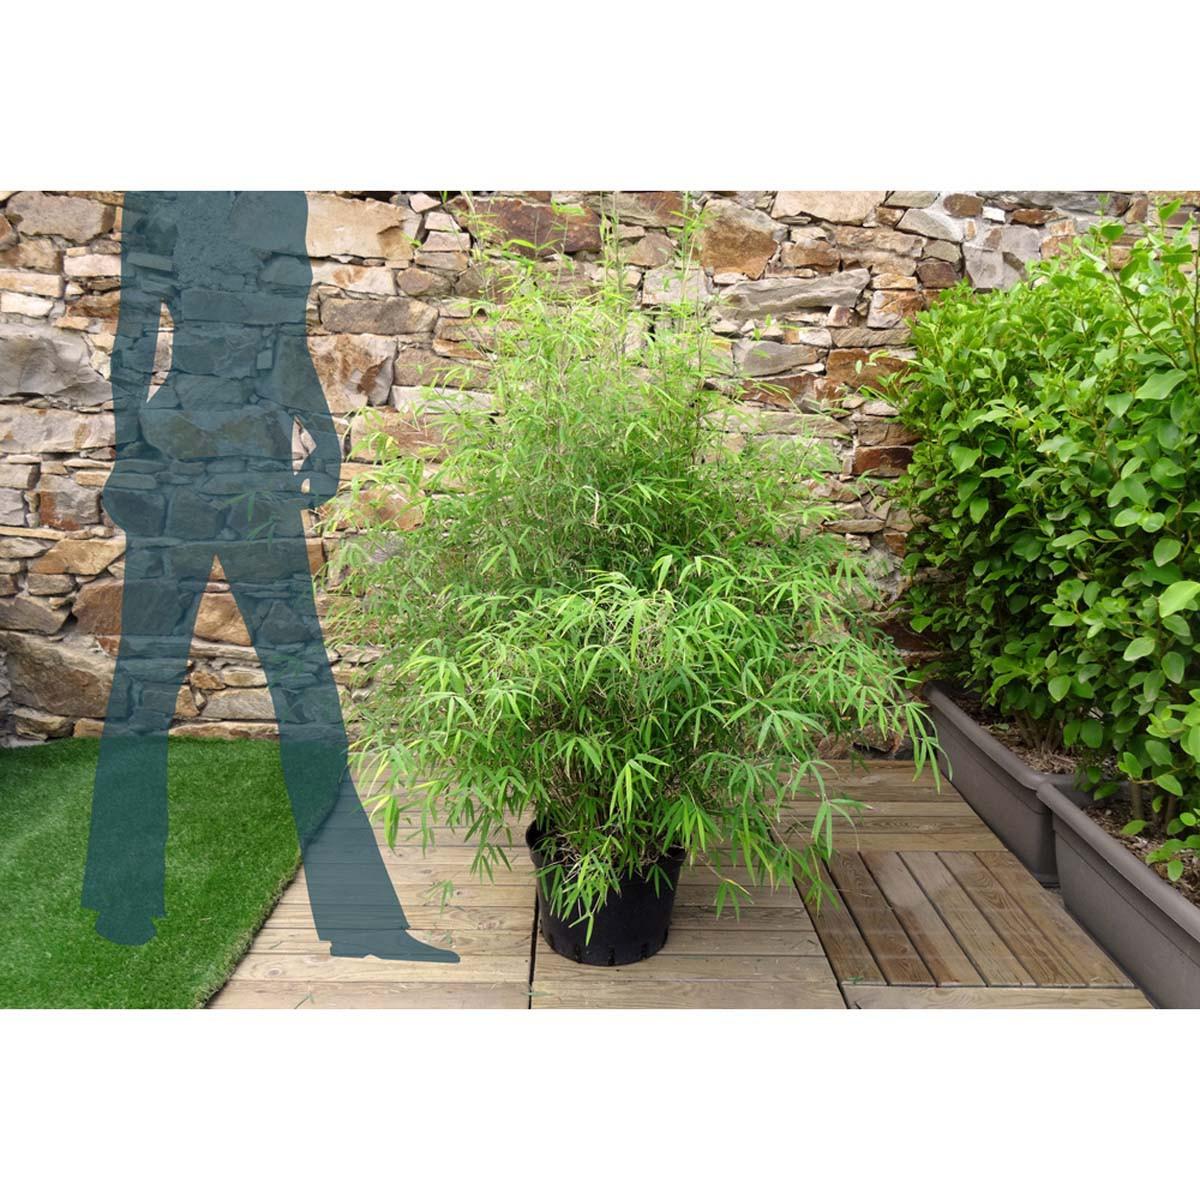 bambou non tra ant c15 20l mon jardin vivre. Black Bedroom Furniture Sets. Home Design Ideas